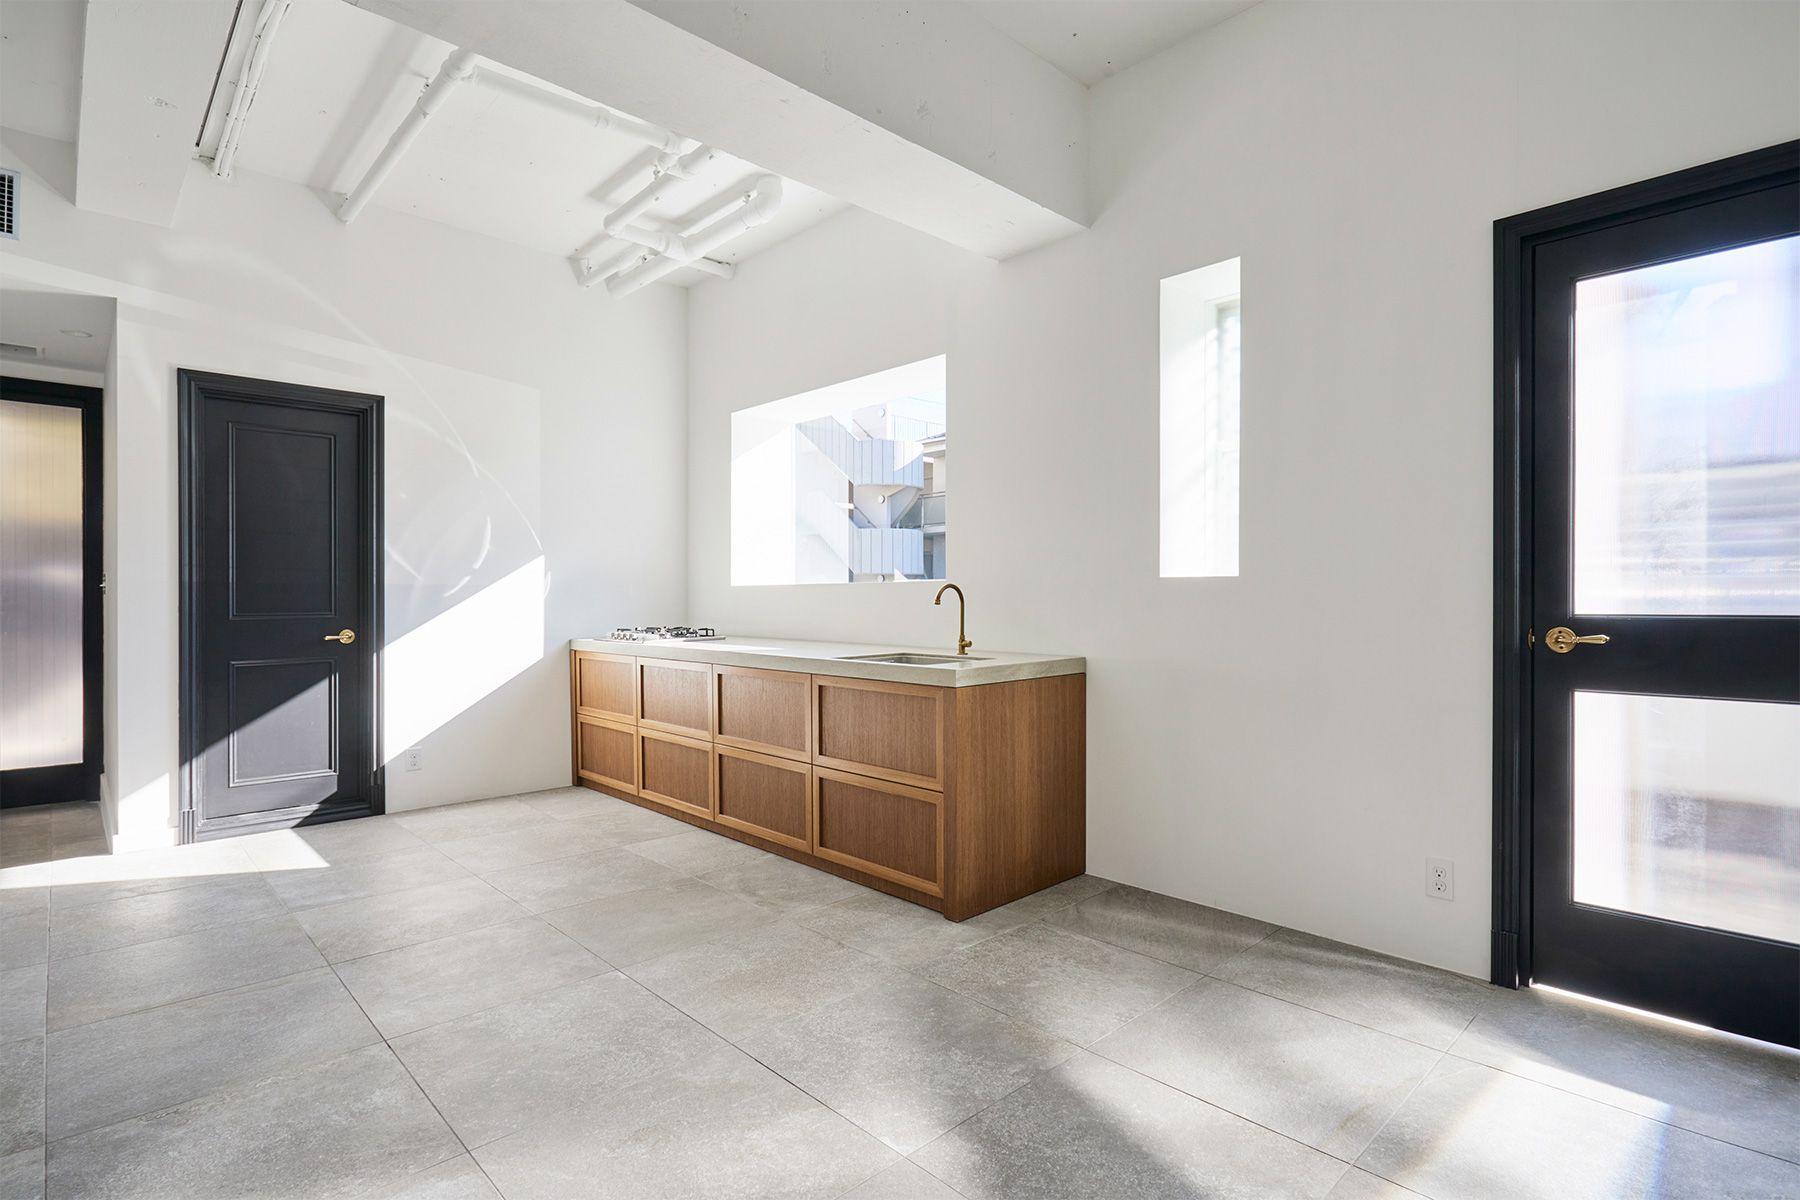 Haku Studio / THE HOUSE (ハクスタジオ)窓とキッチン(移動式モック)